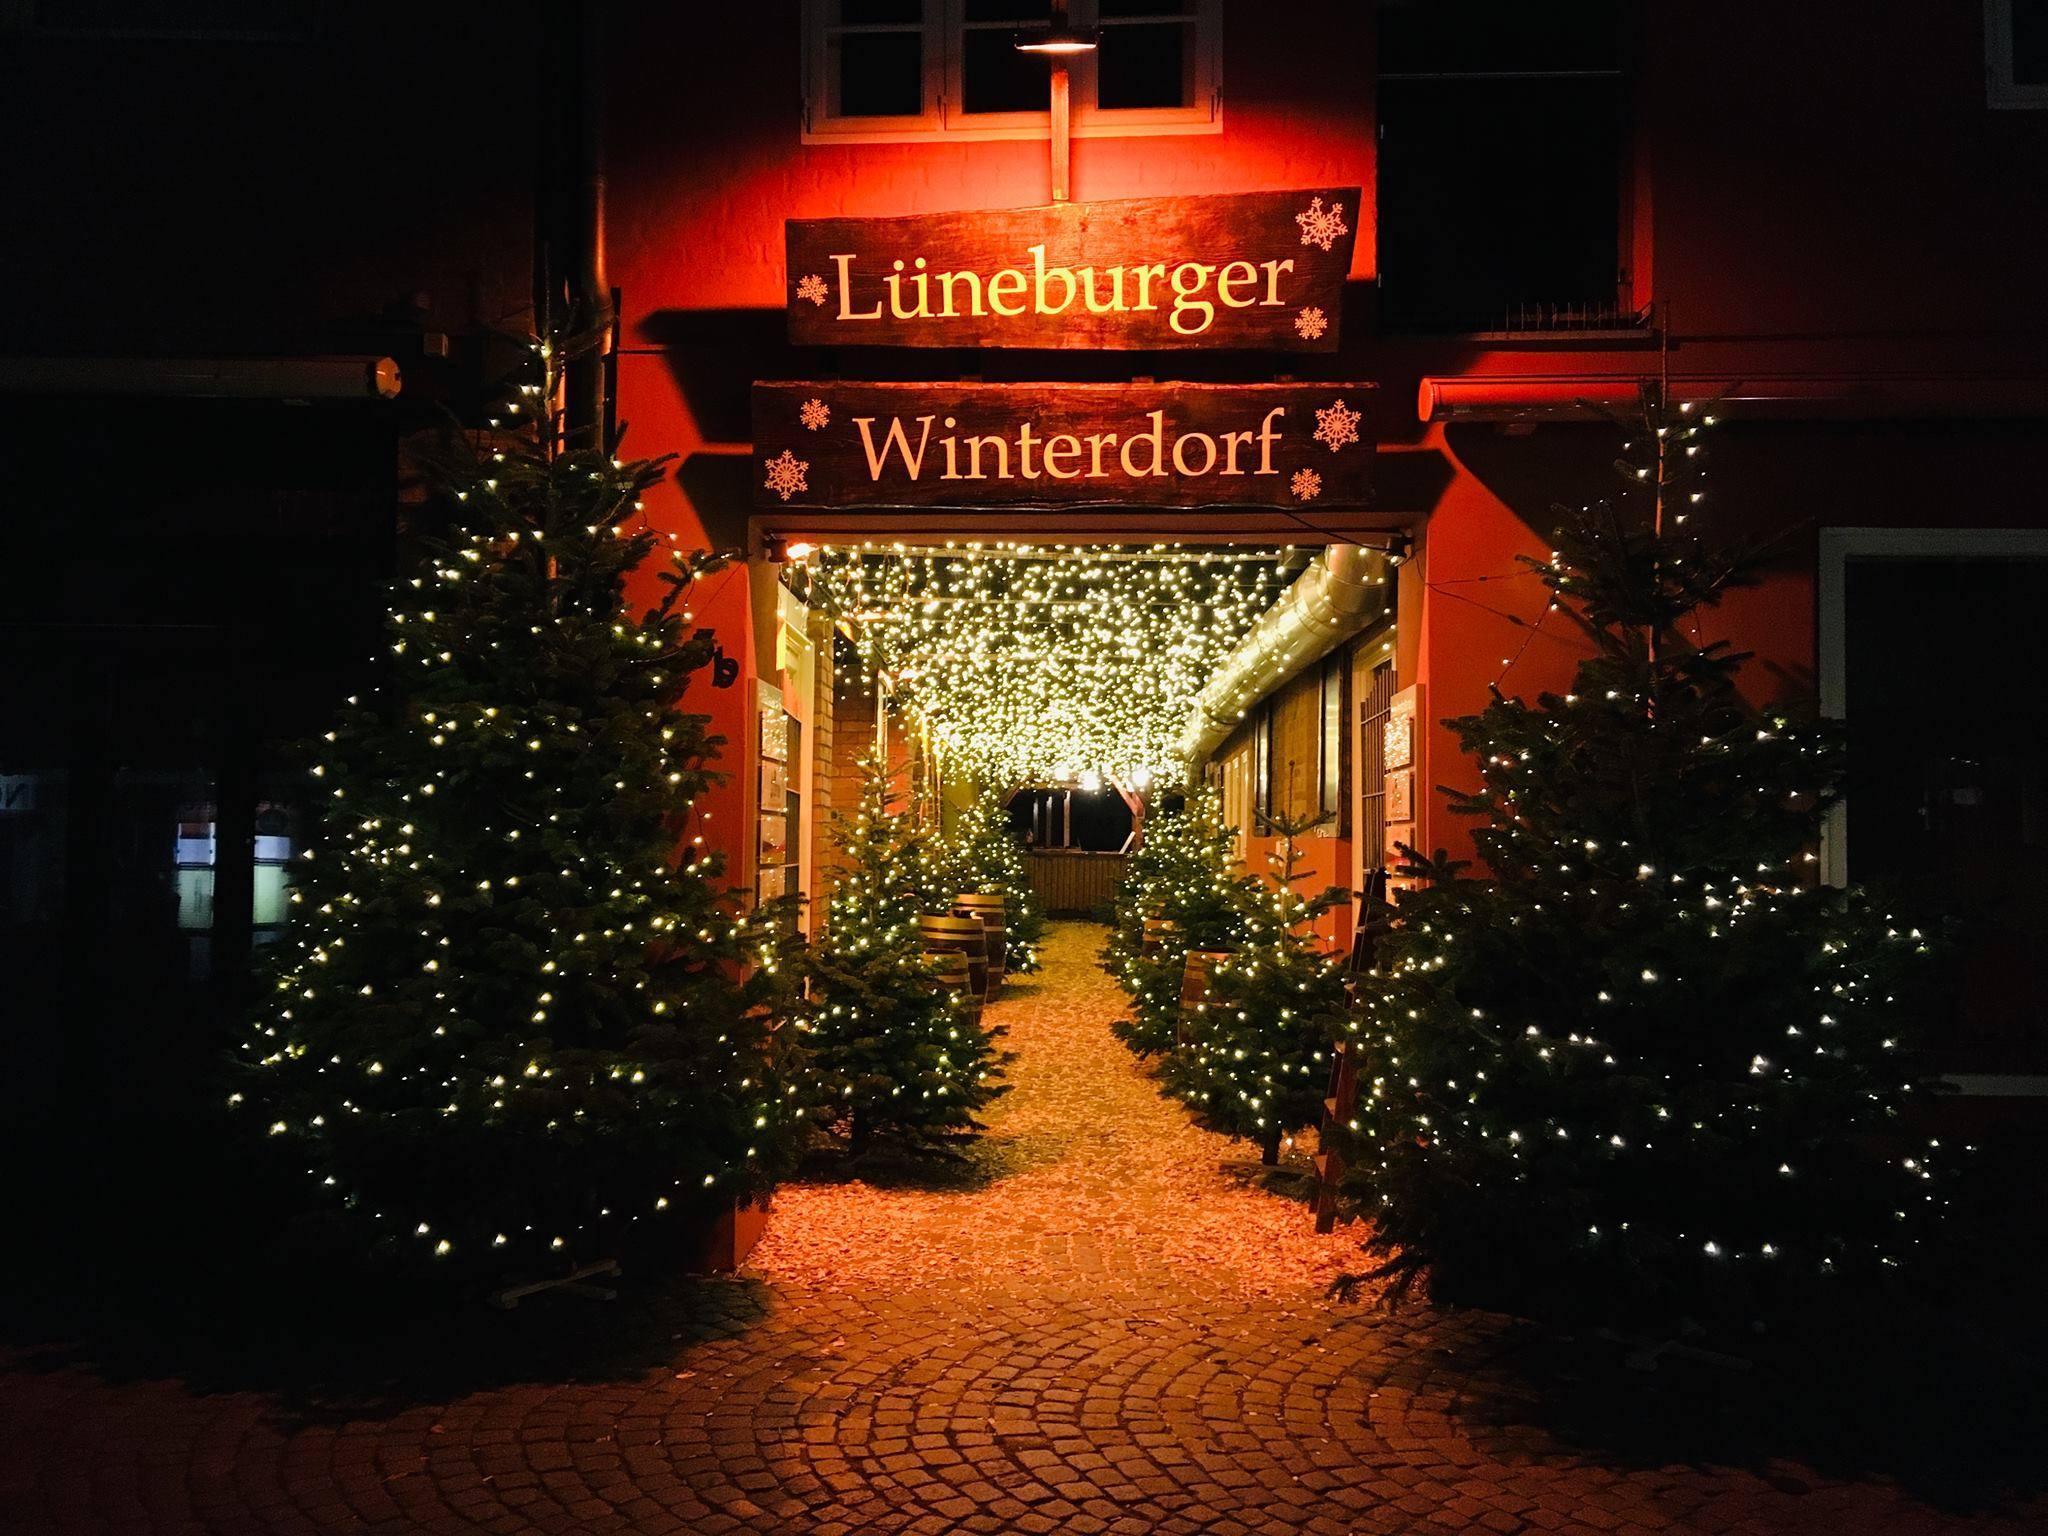 Lüneburger Winterdorf